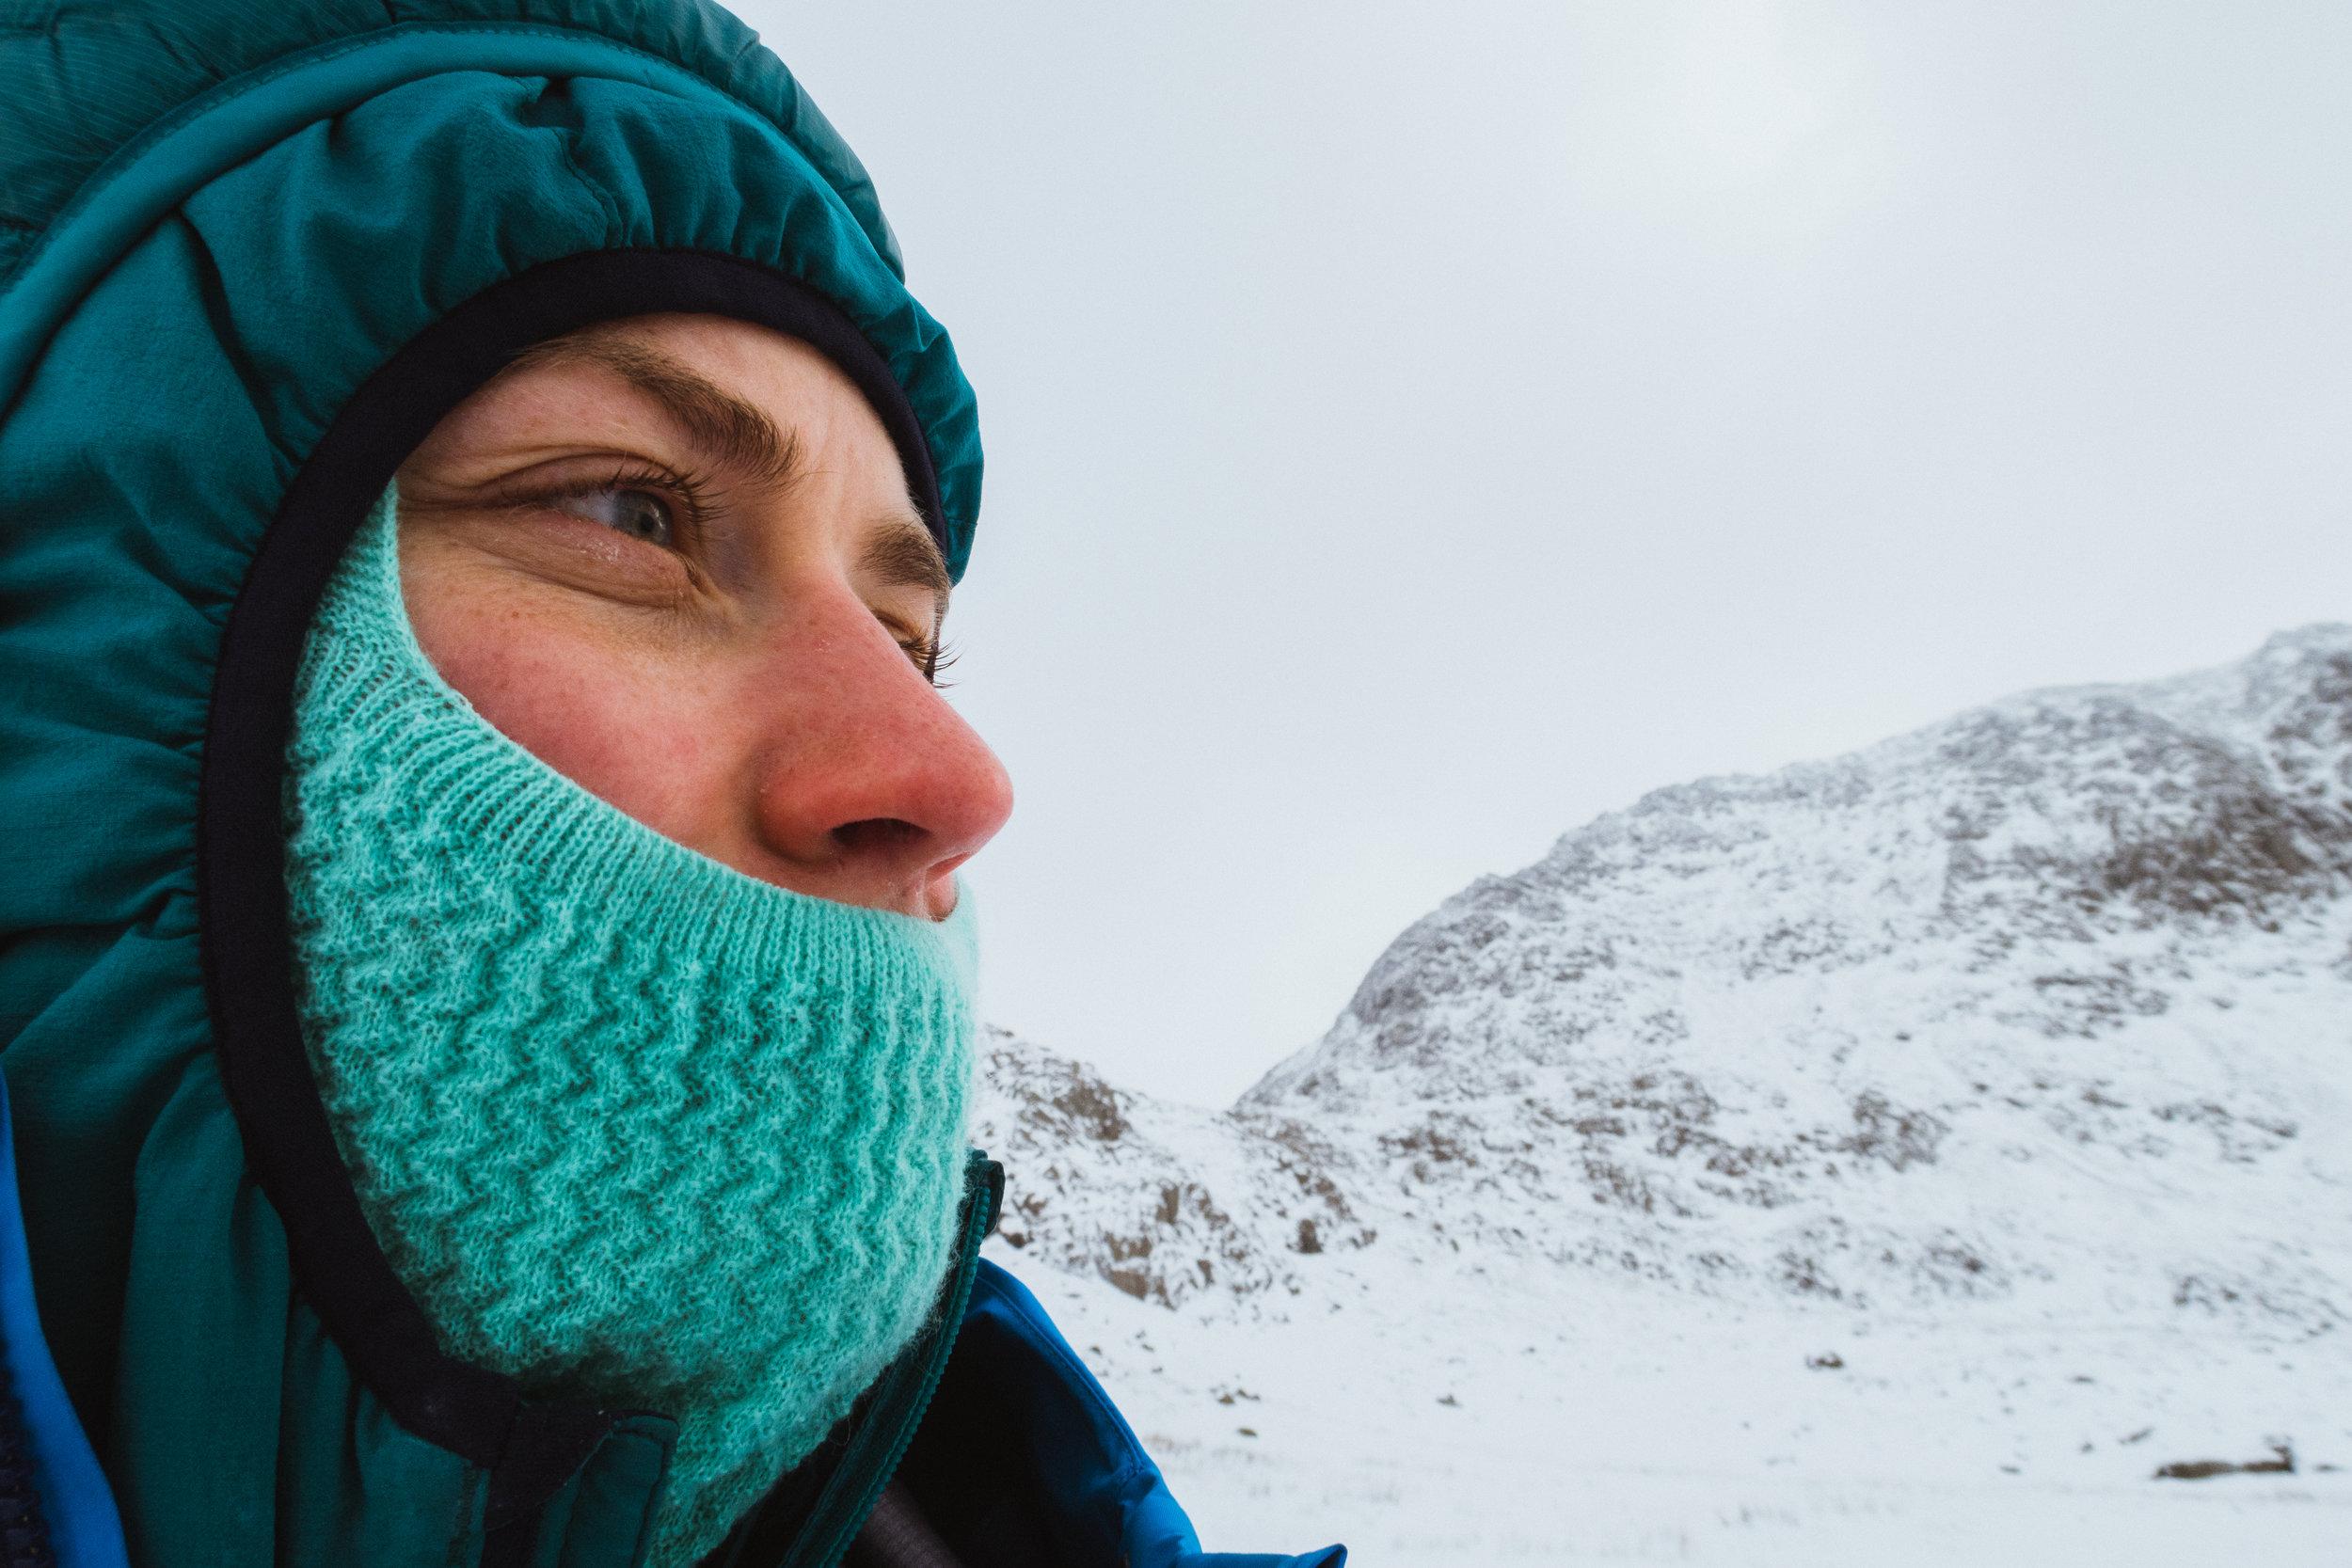 Patagonia Capilene Air Hoody